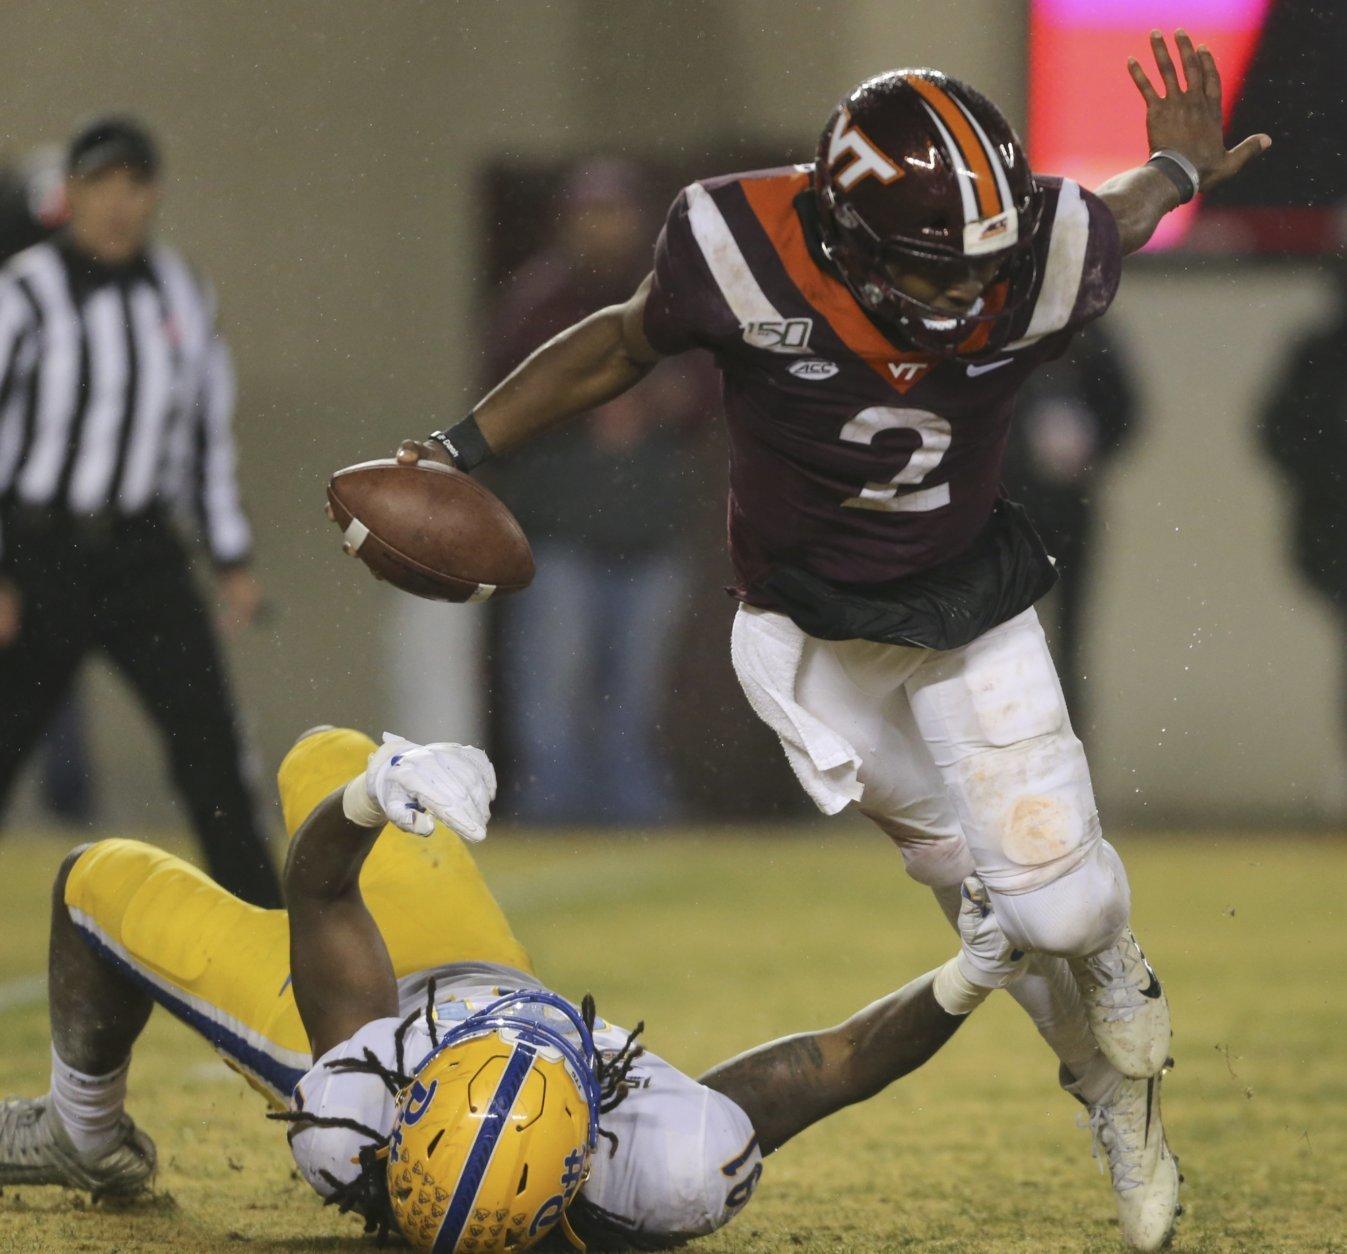 Hooker S 2 Td Passes Lead No 25 Virginia Tech Over Pitt Wtop